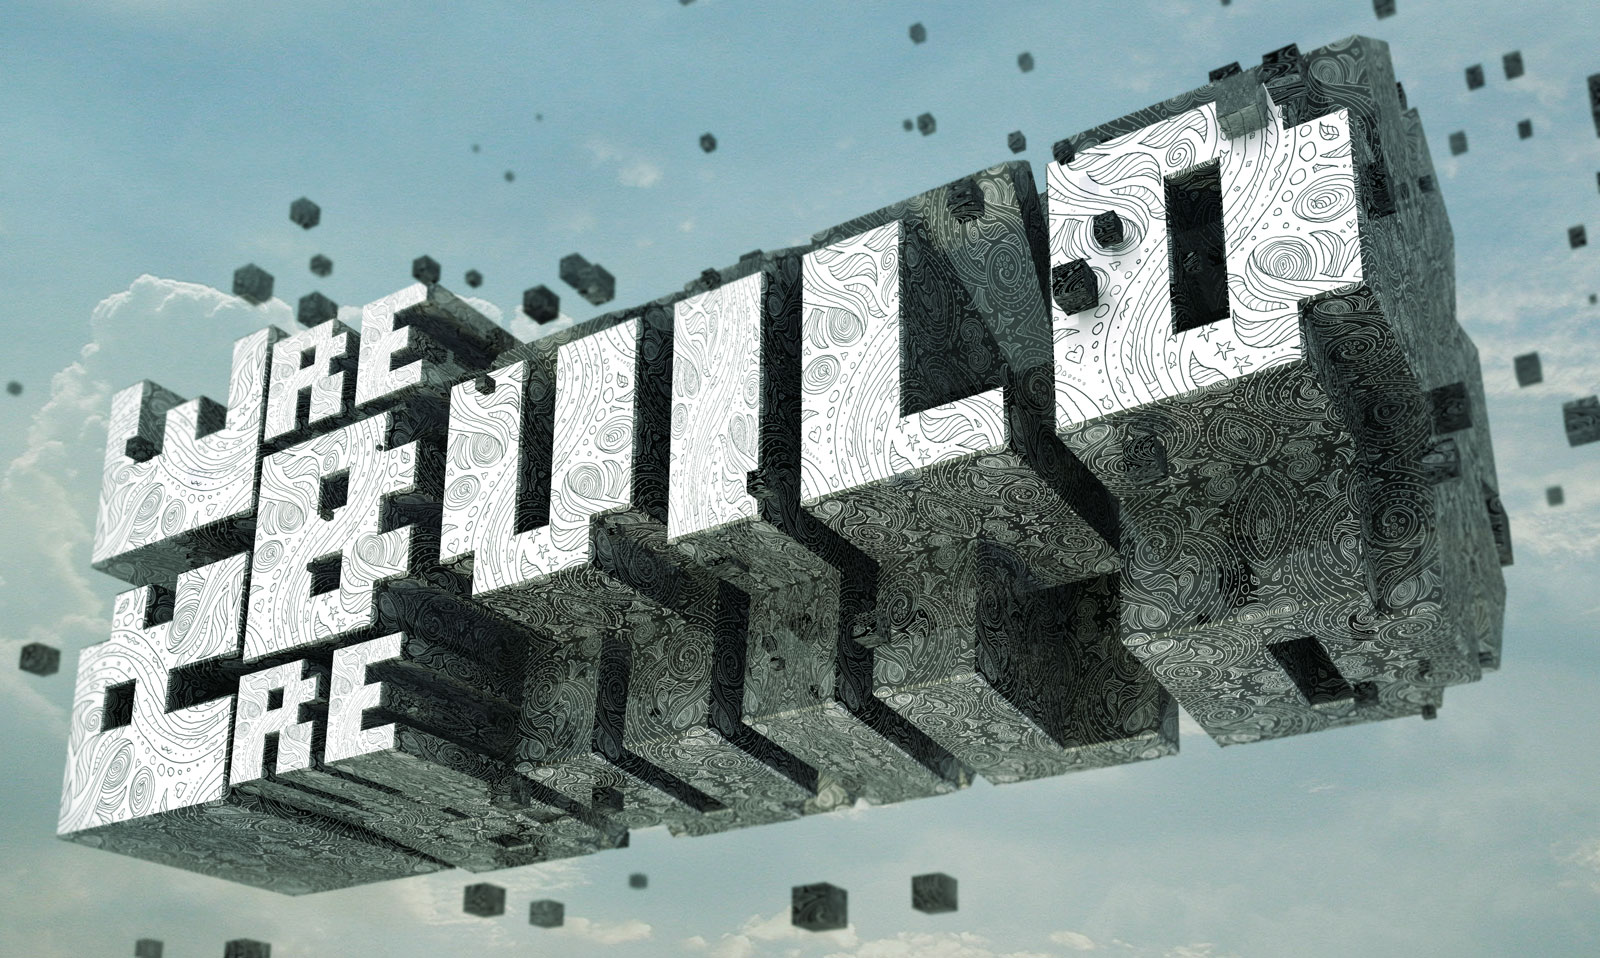 Rebuild 3: Gangs of Deadsville v1.5.3 Immagini